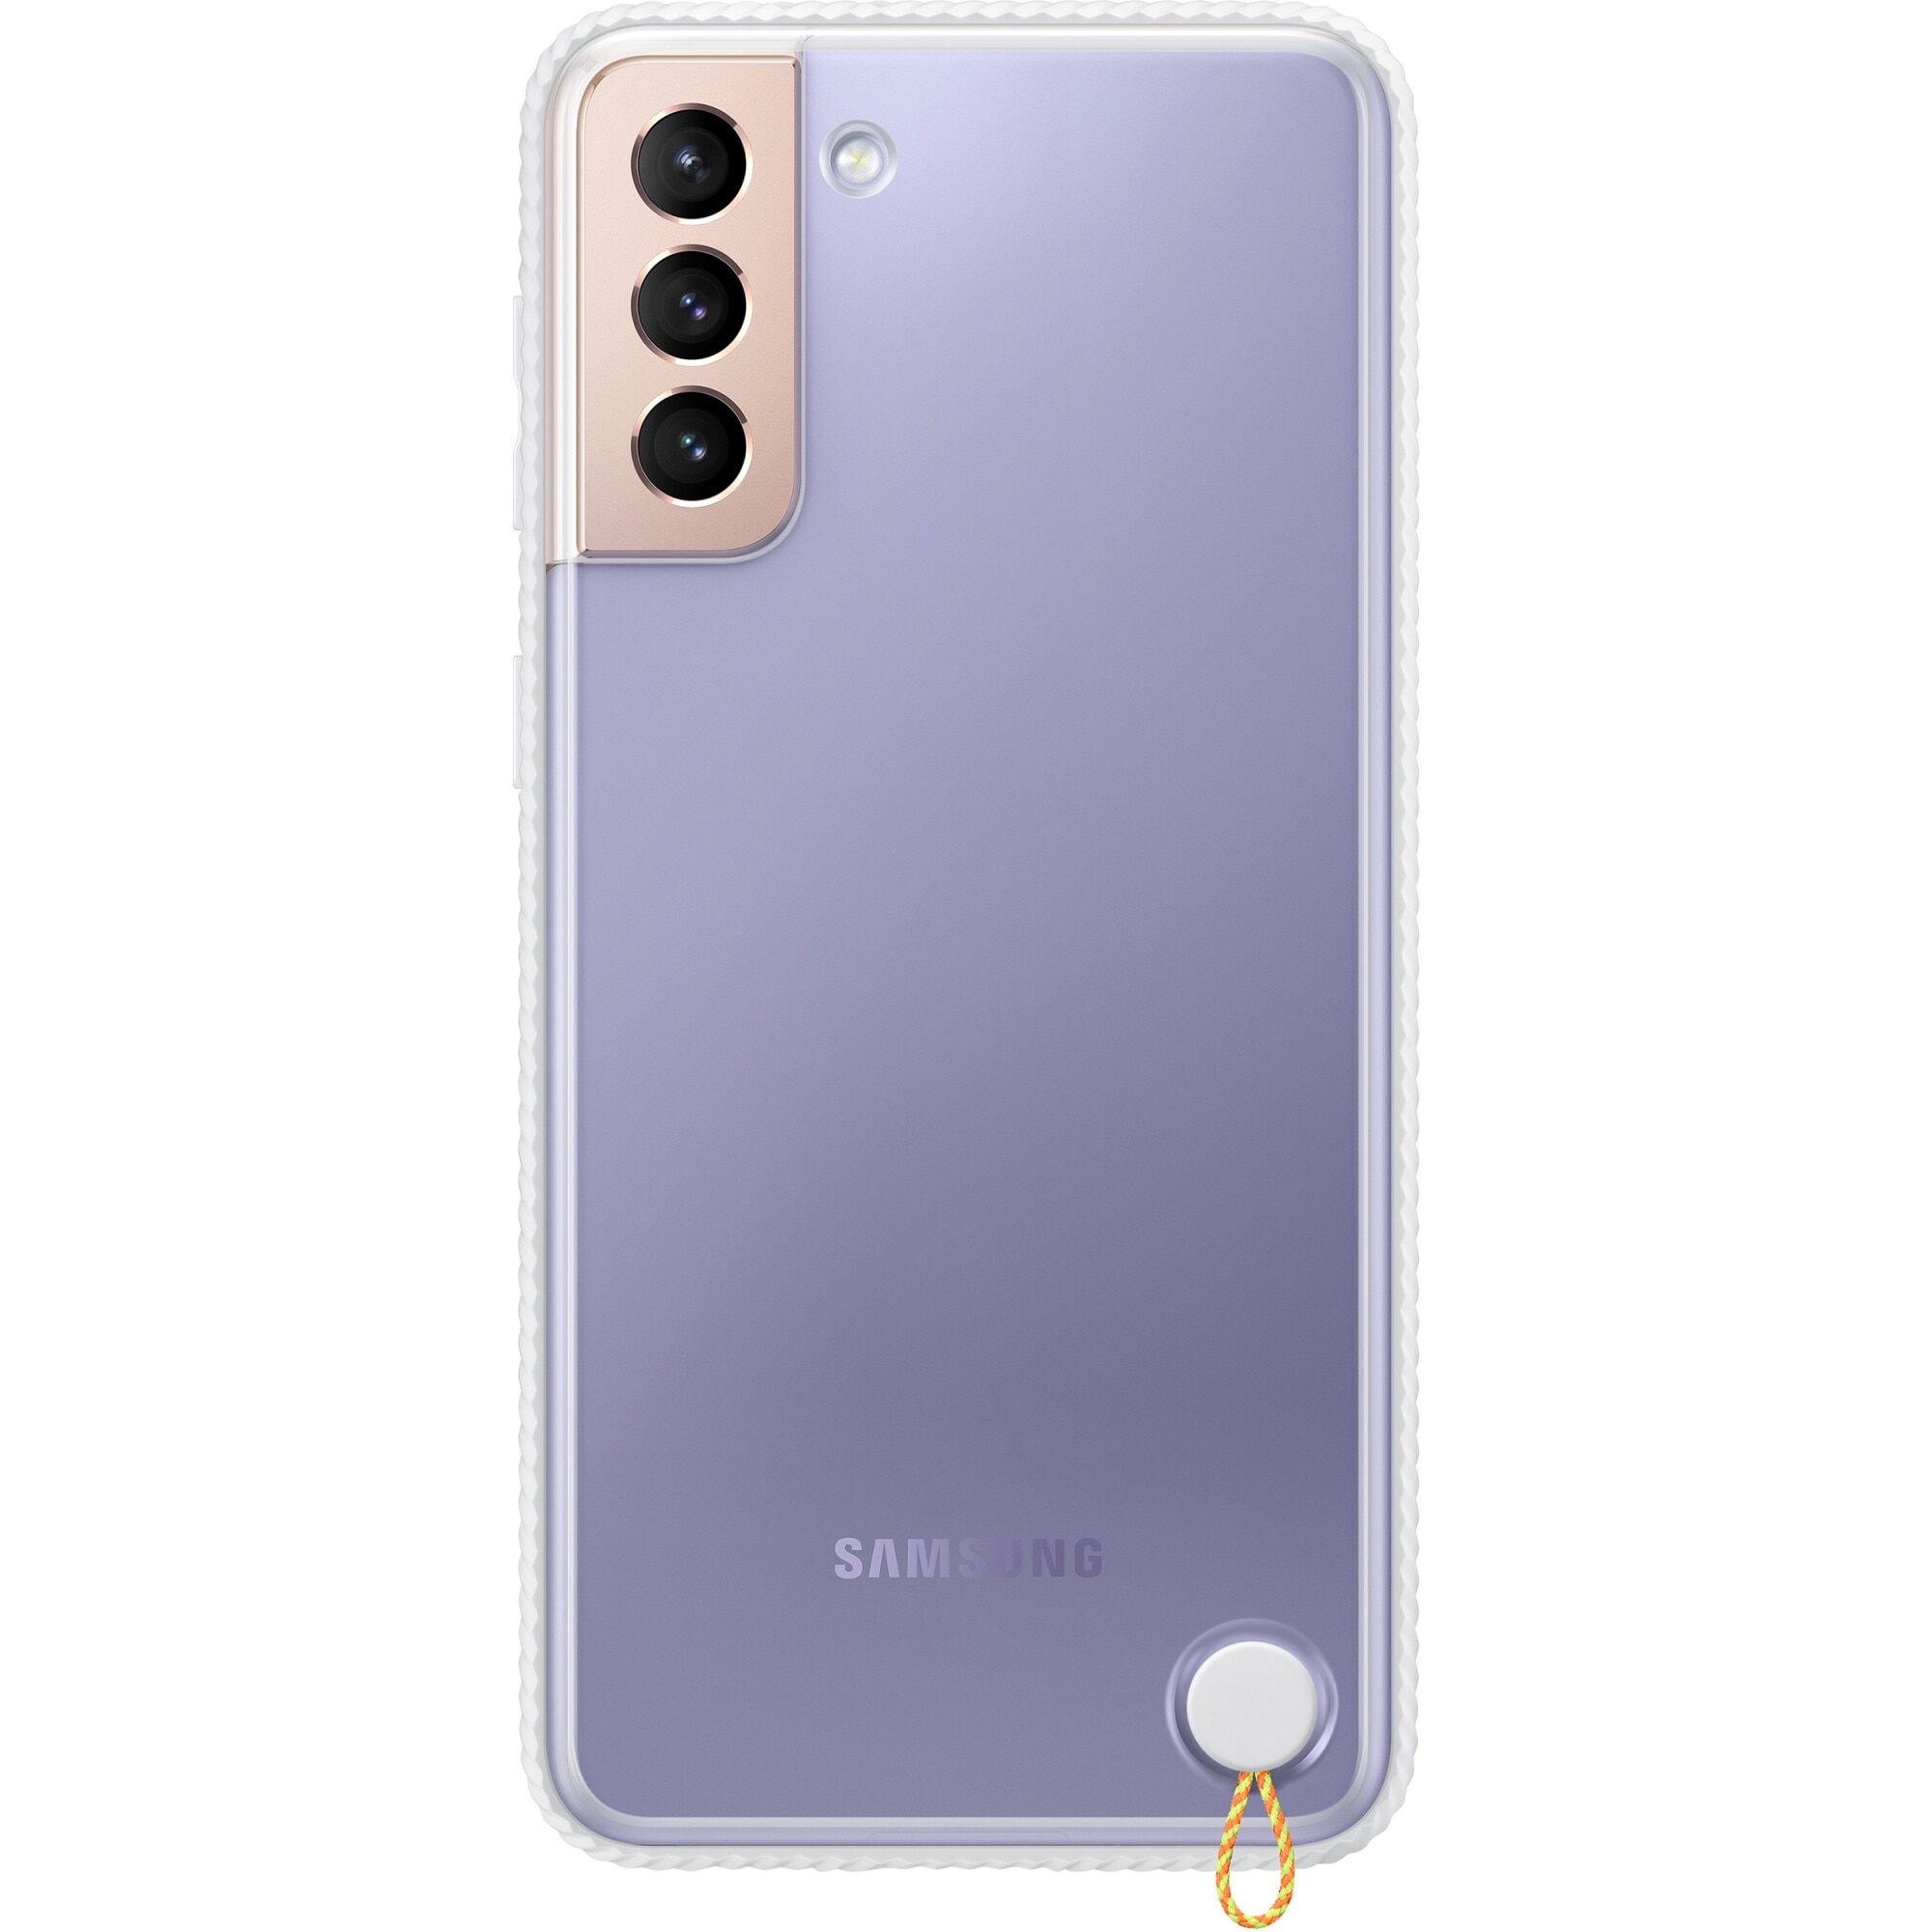 Fotografie Husa de protectie Samsung Clear Protective Cover pentru Galaxy S21 Plus, White